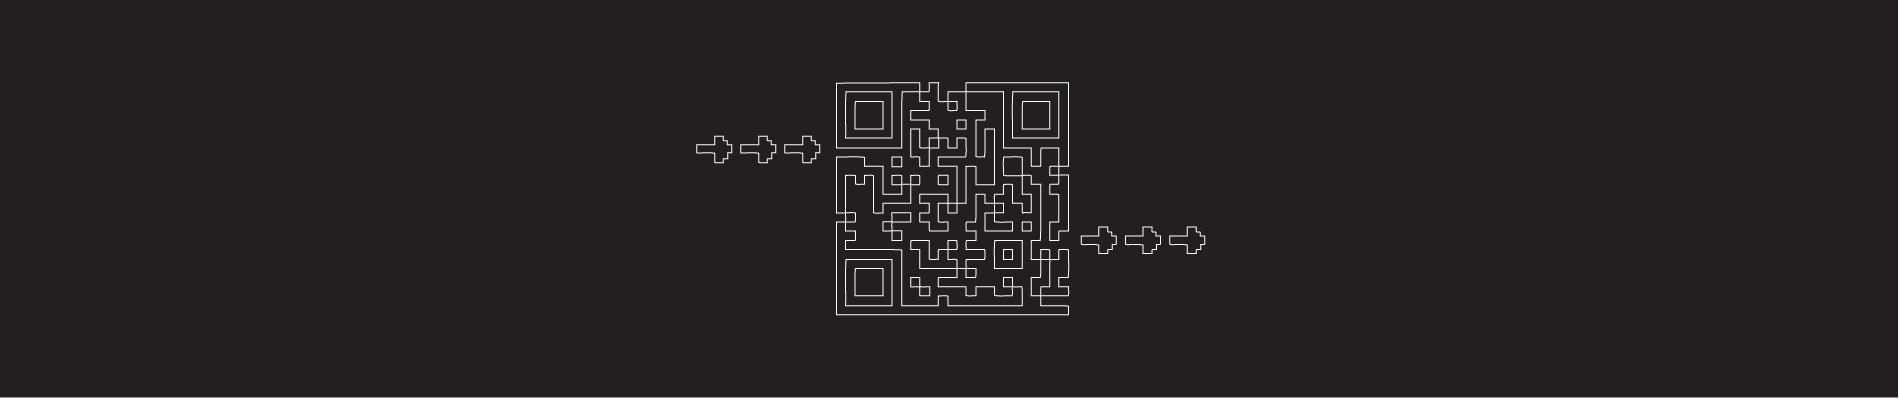 QR Code Labyrinthe